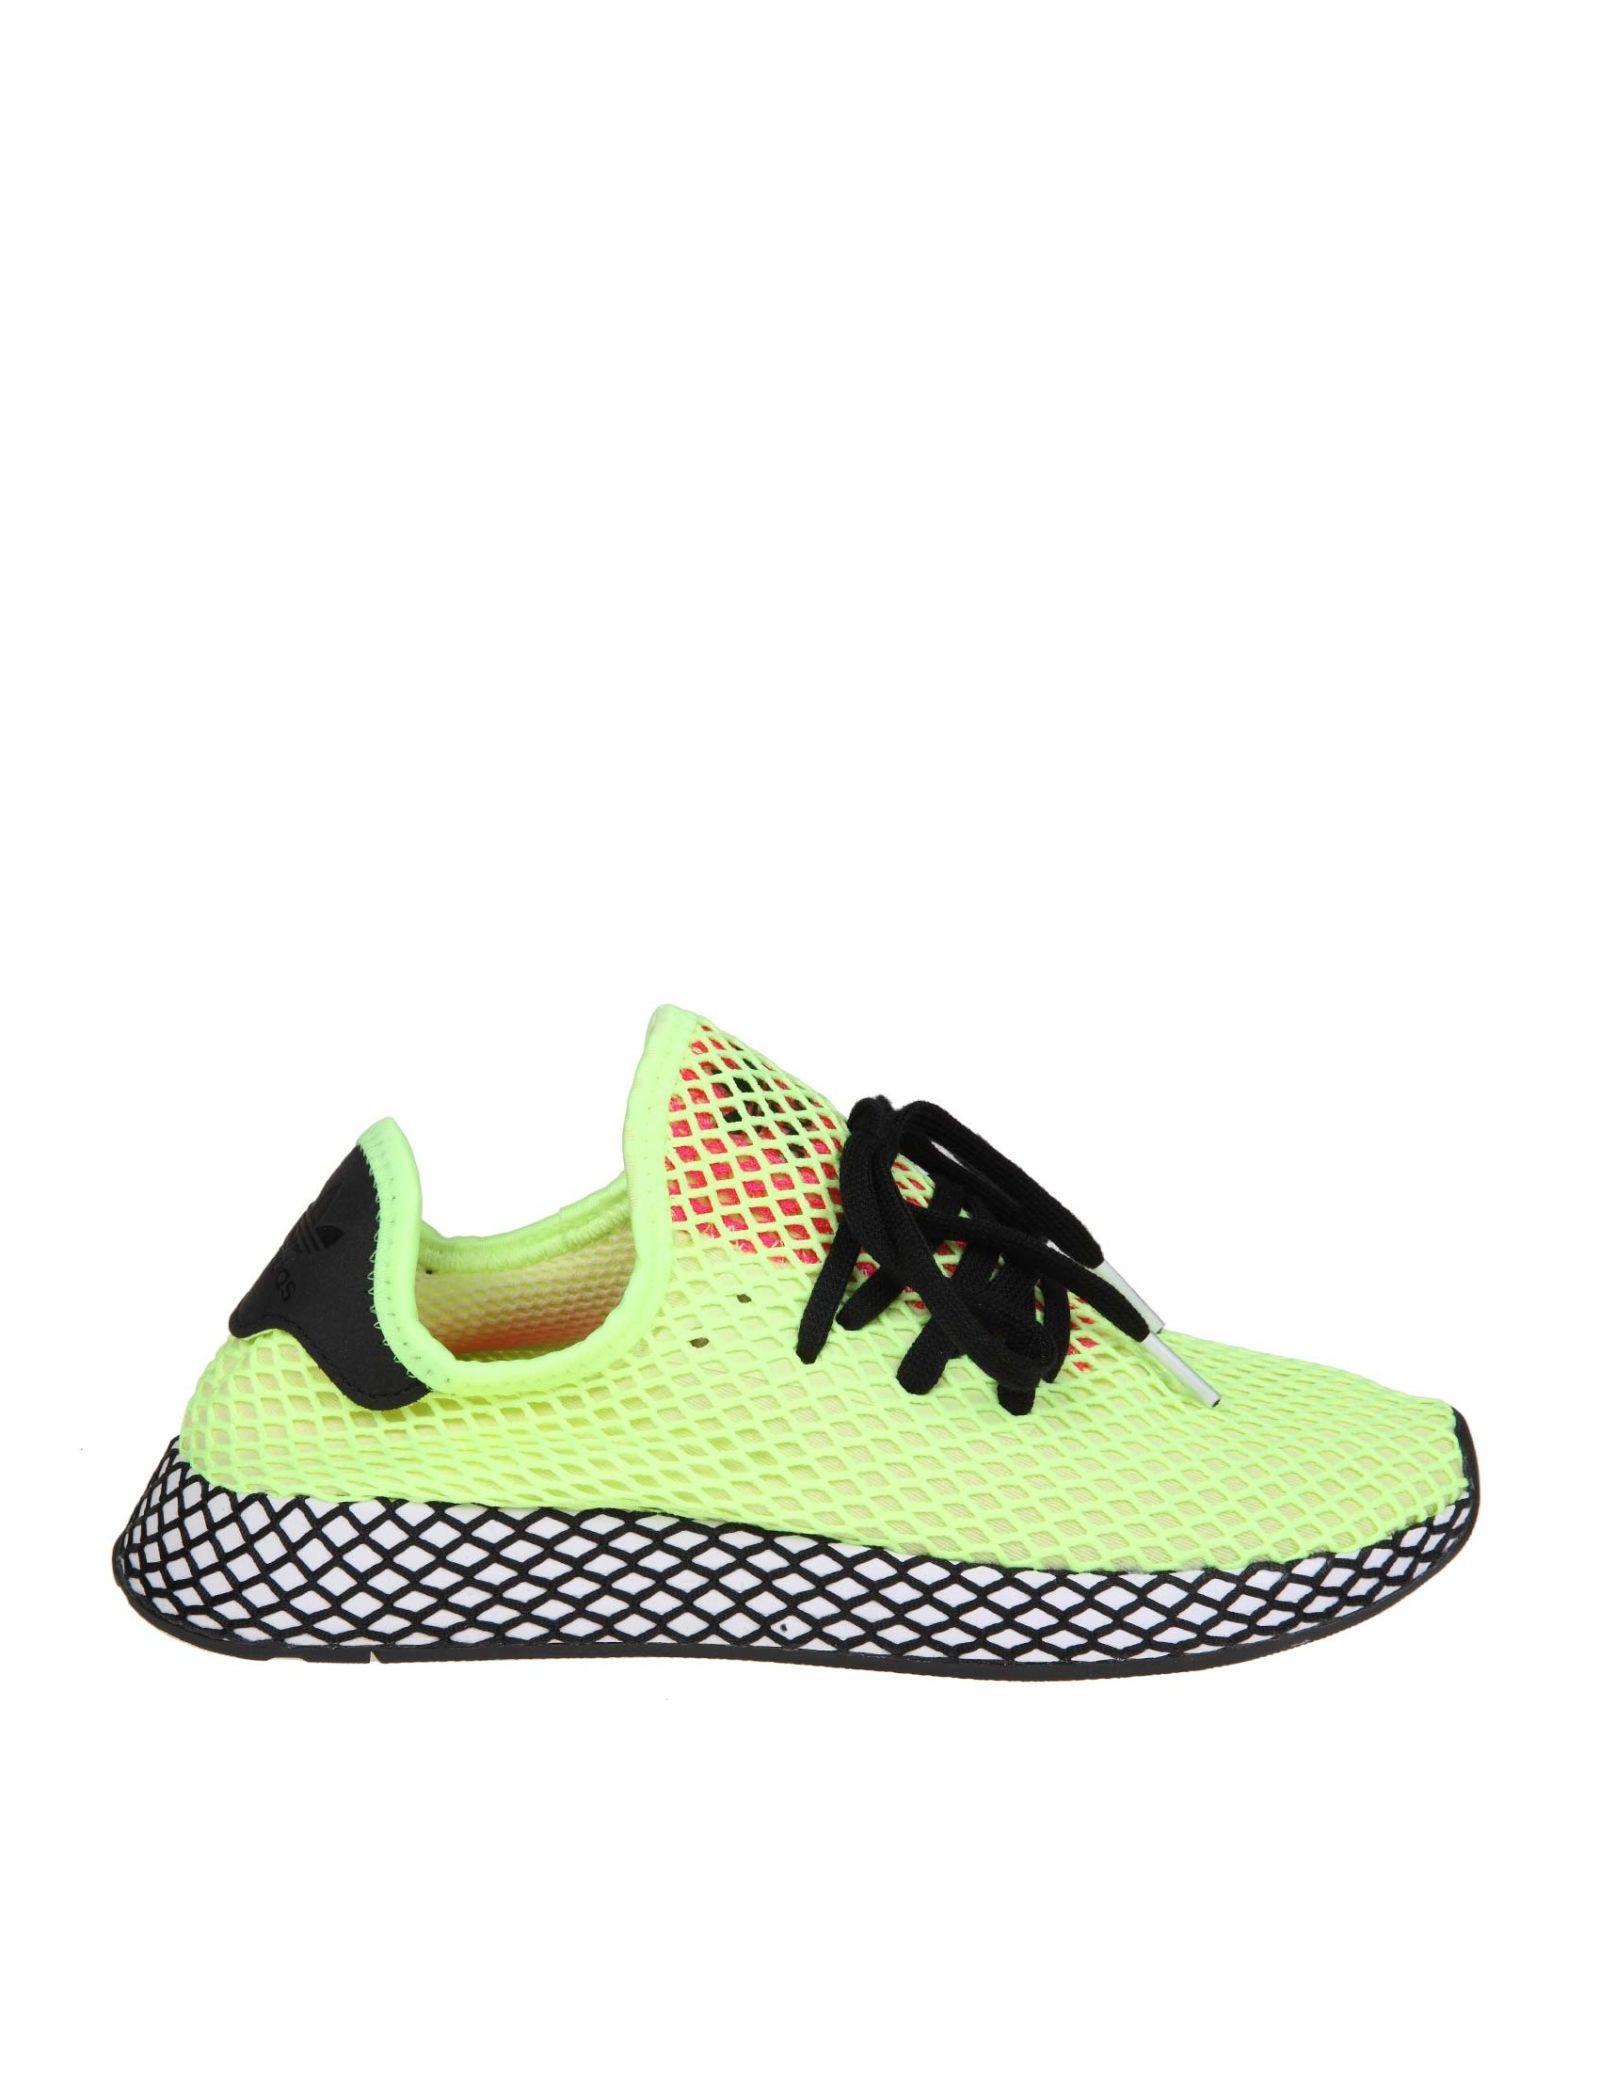 3dee33535428f Adidas Originals Adidas Sneakers Deerupt Runner In Stretch Fabric Yellow  Fluo - Yellow ...